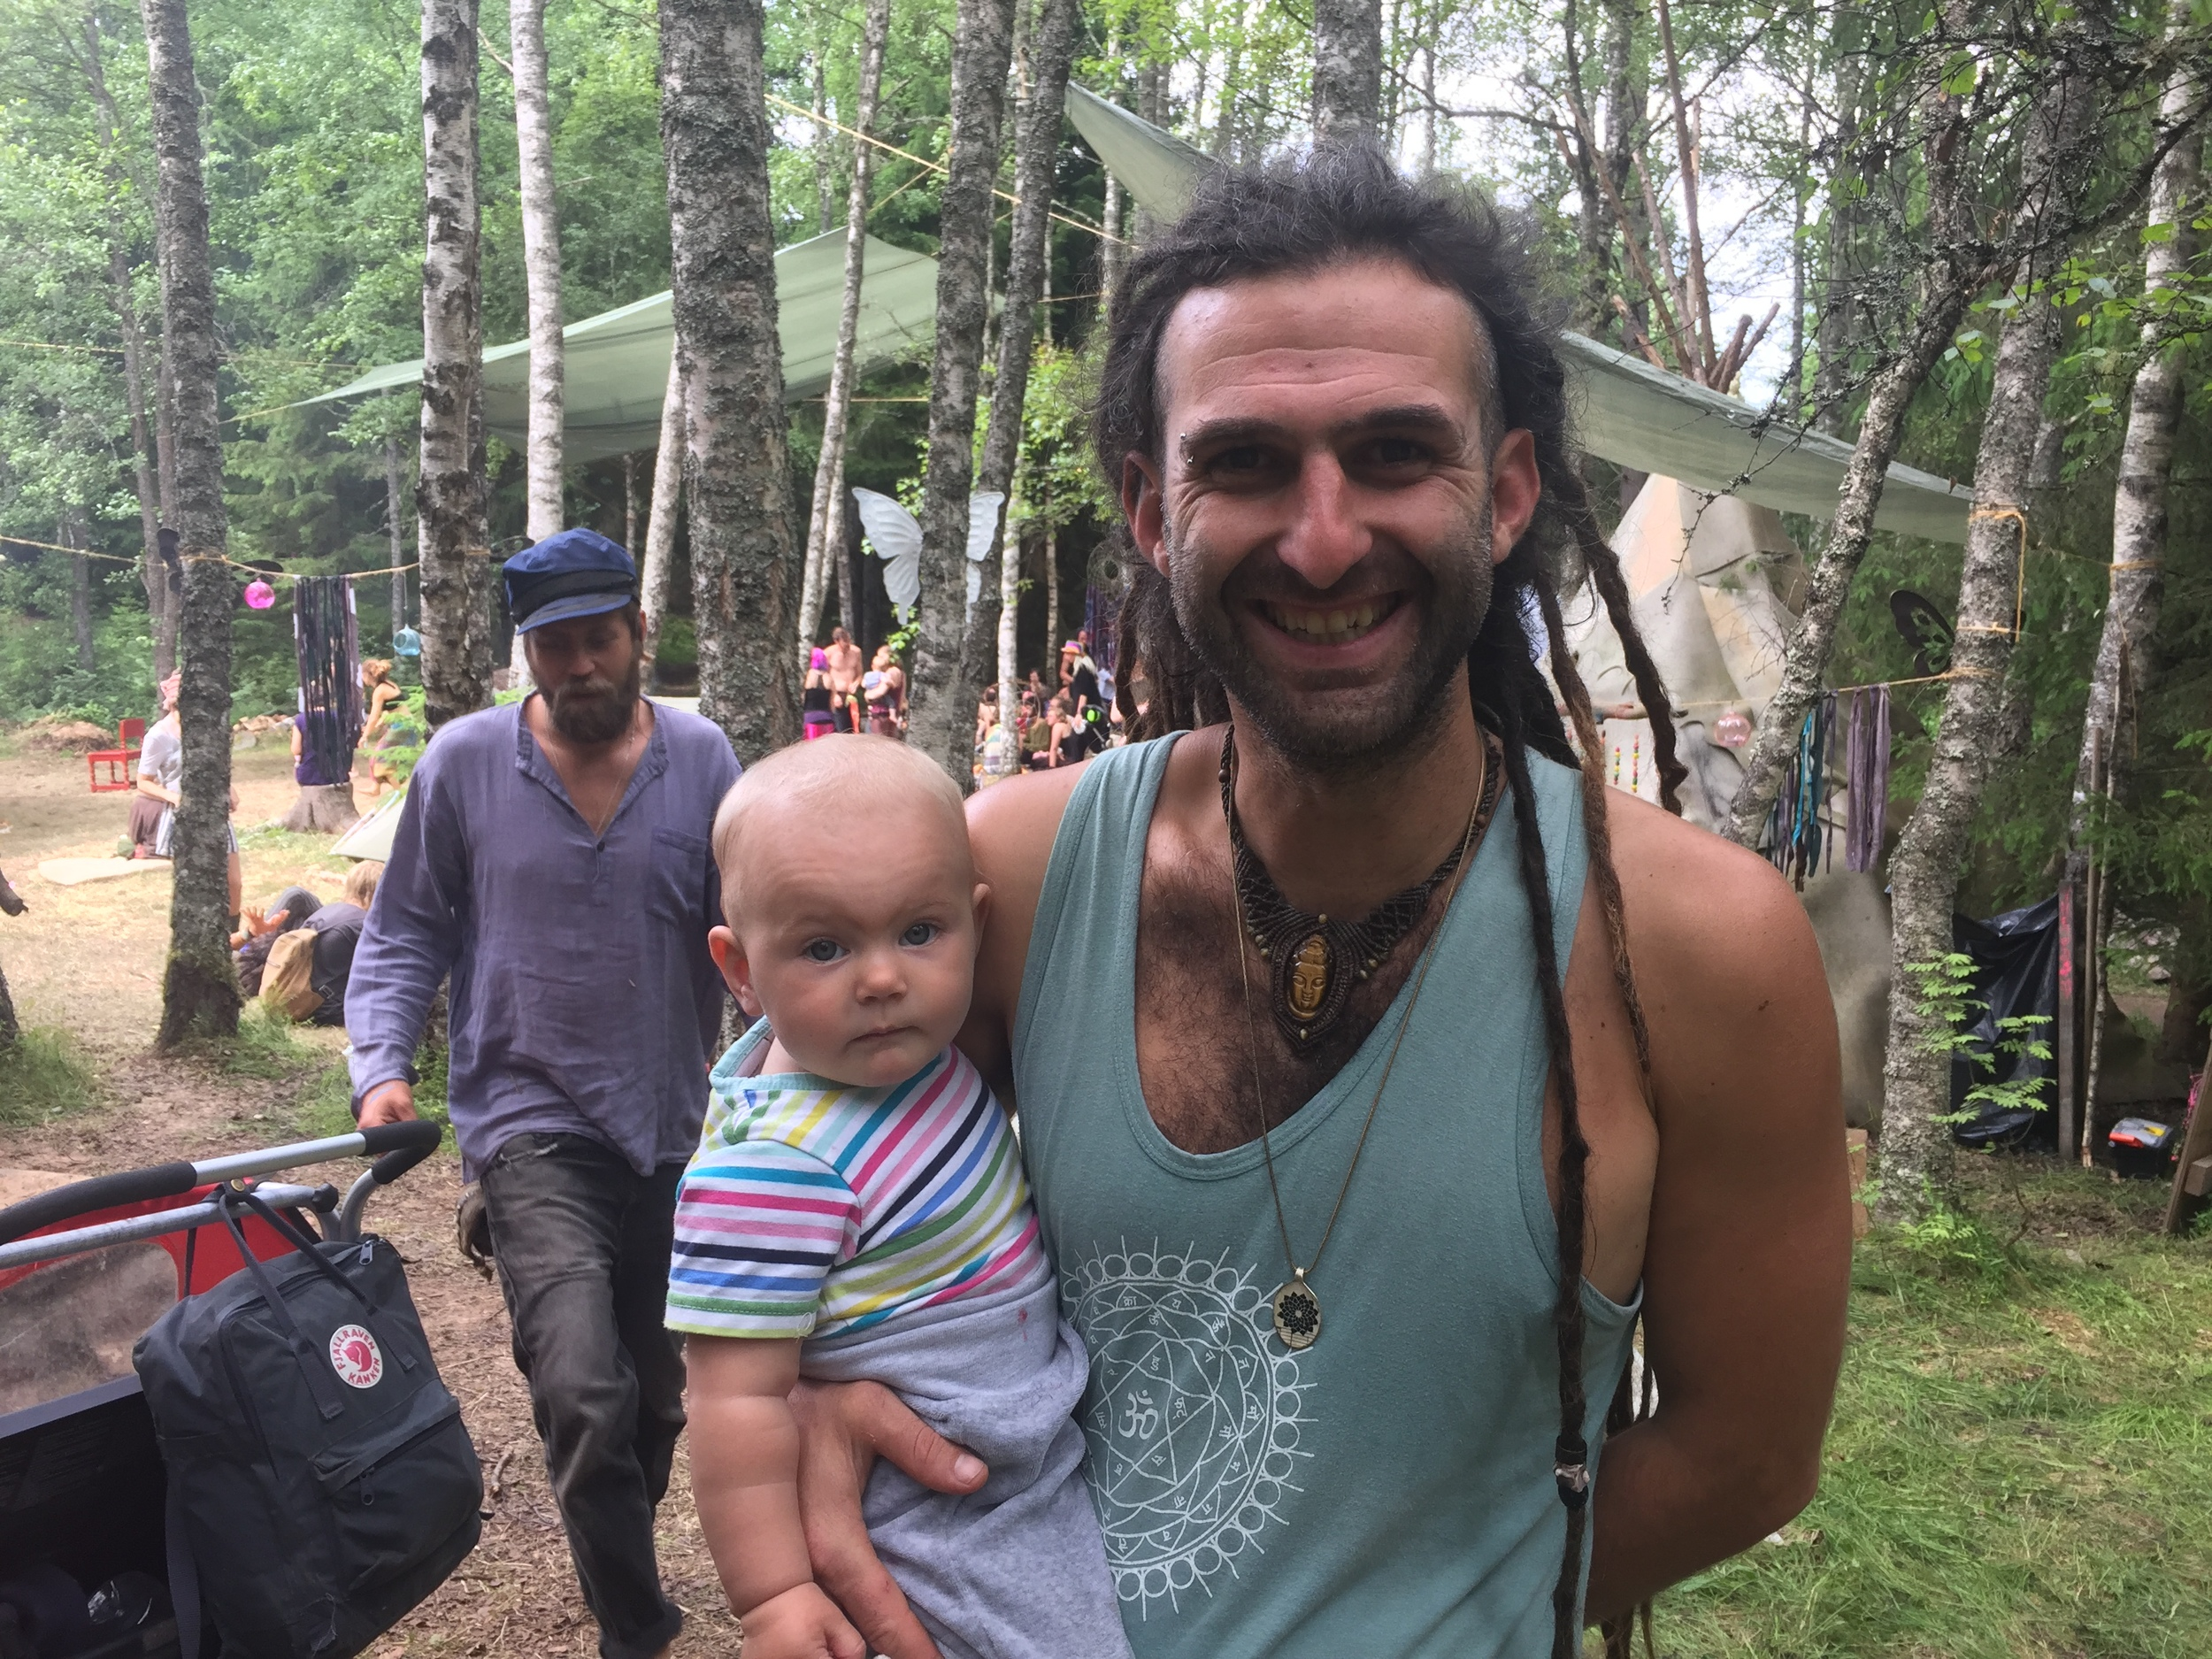 Hippies should make more babies.